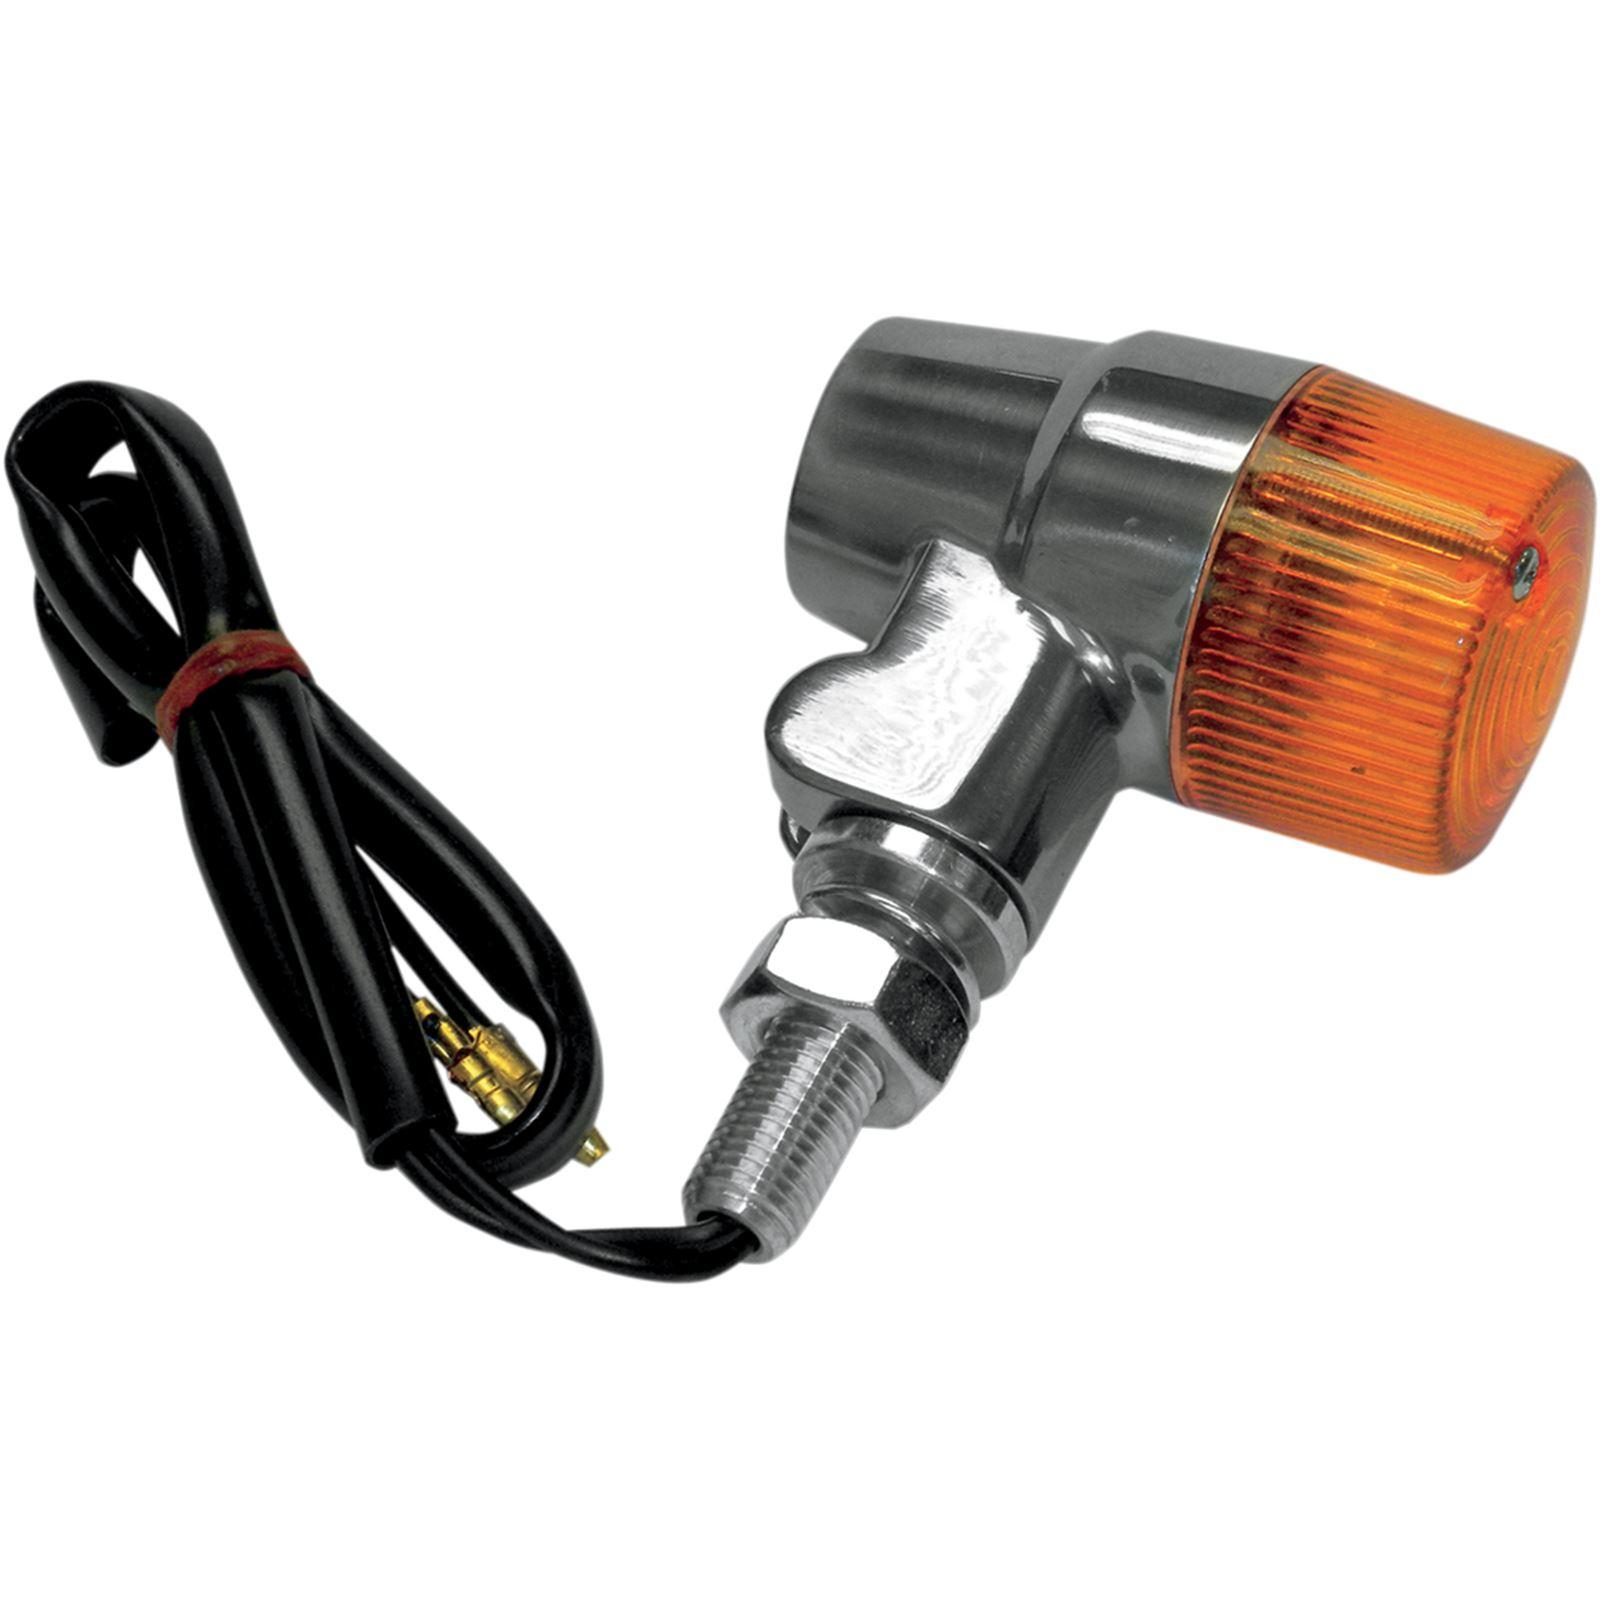 K S Marker Light - Dual Filament - Amber/Aluminum